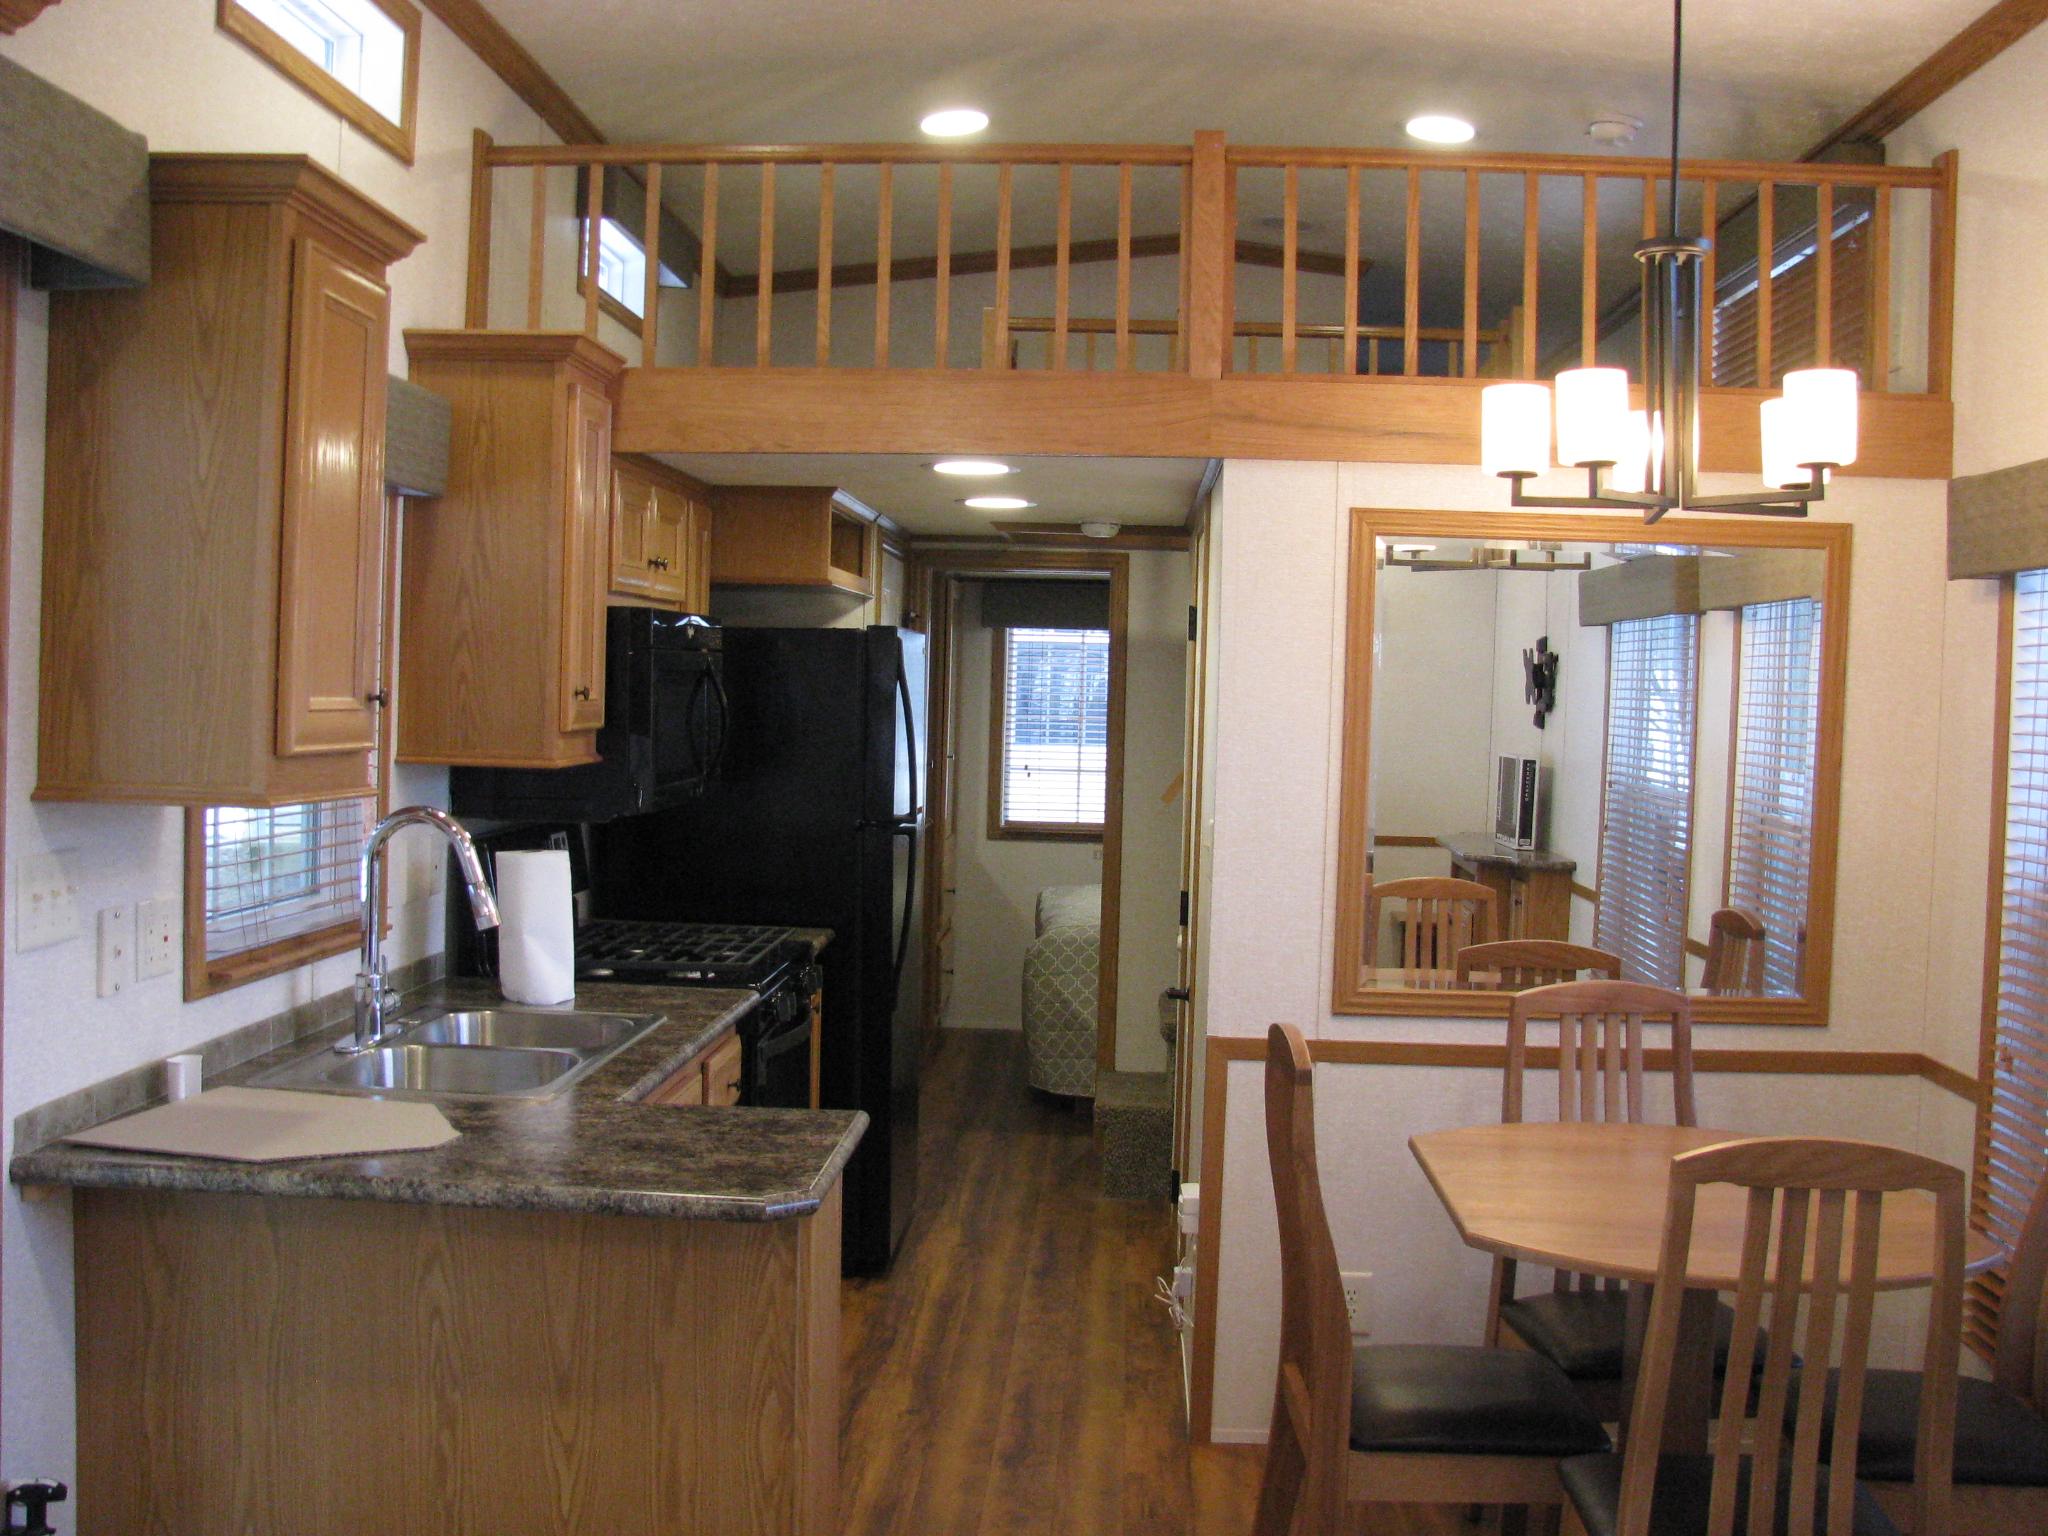 kitchenette, dining room, and loft of skyline trailer